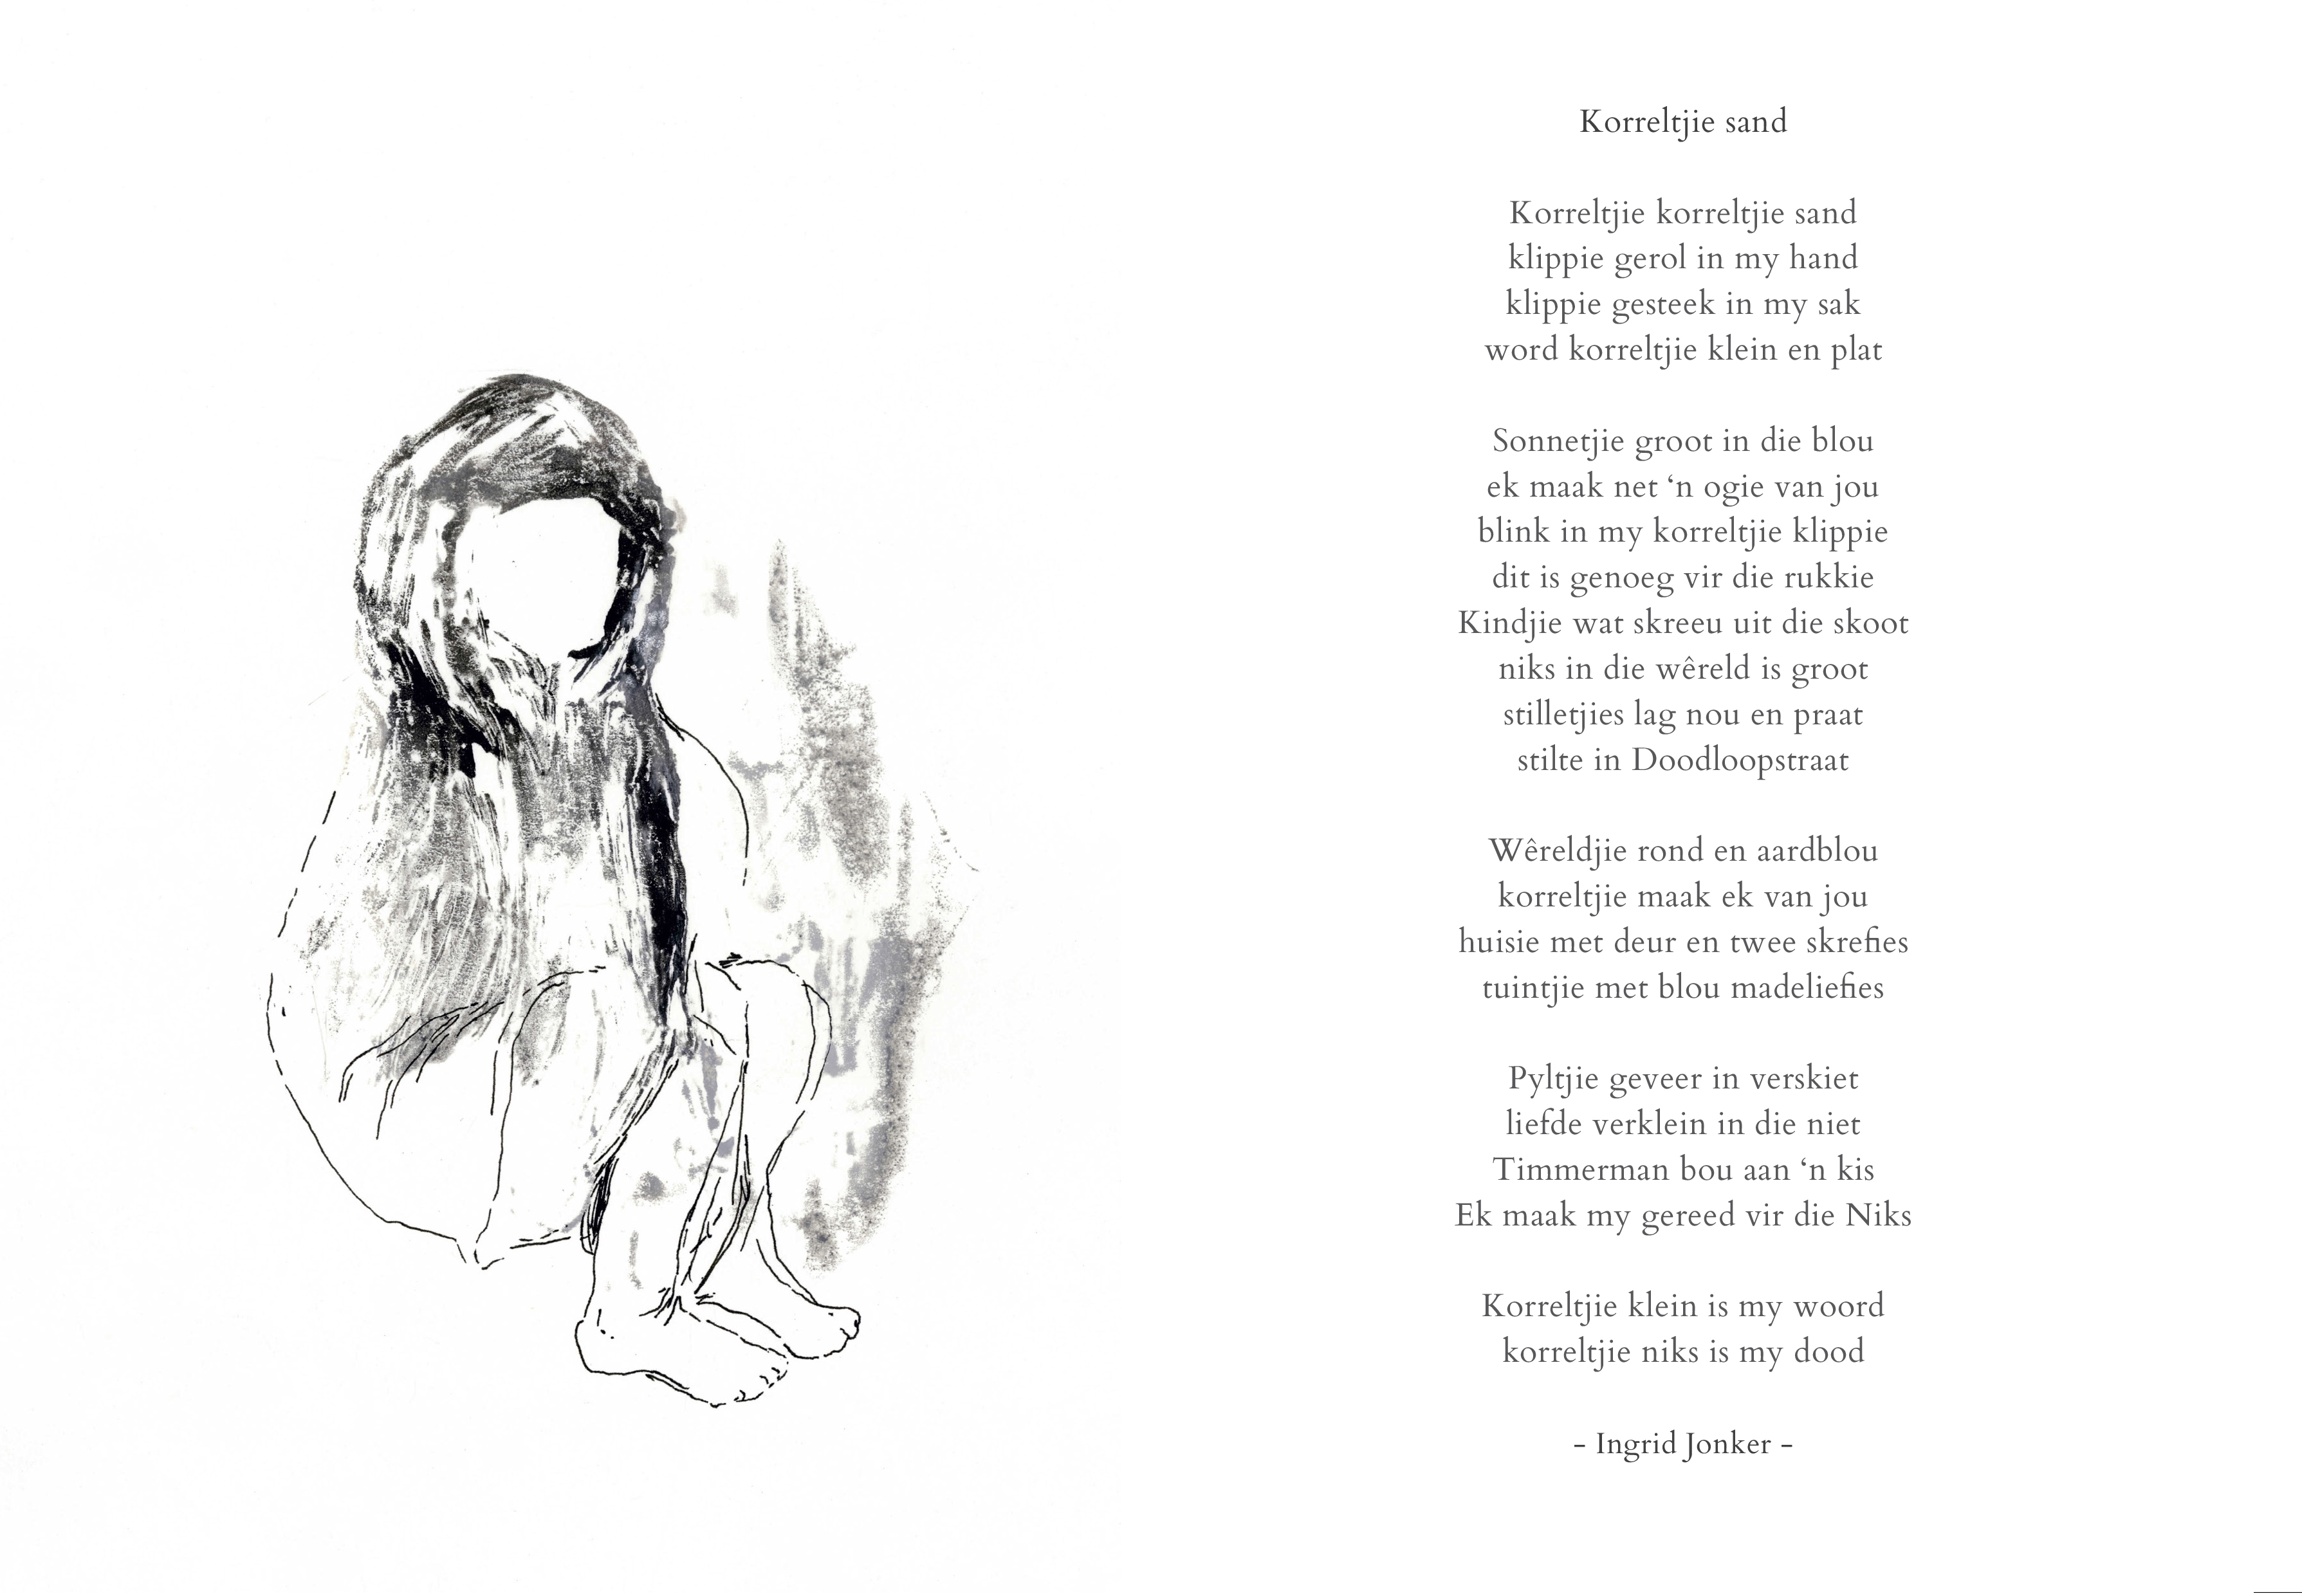 Korreltjie sand_Monoprint and ink on paper